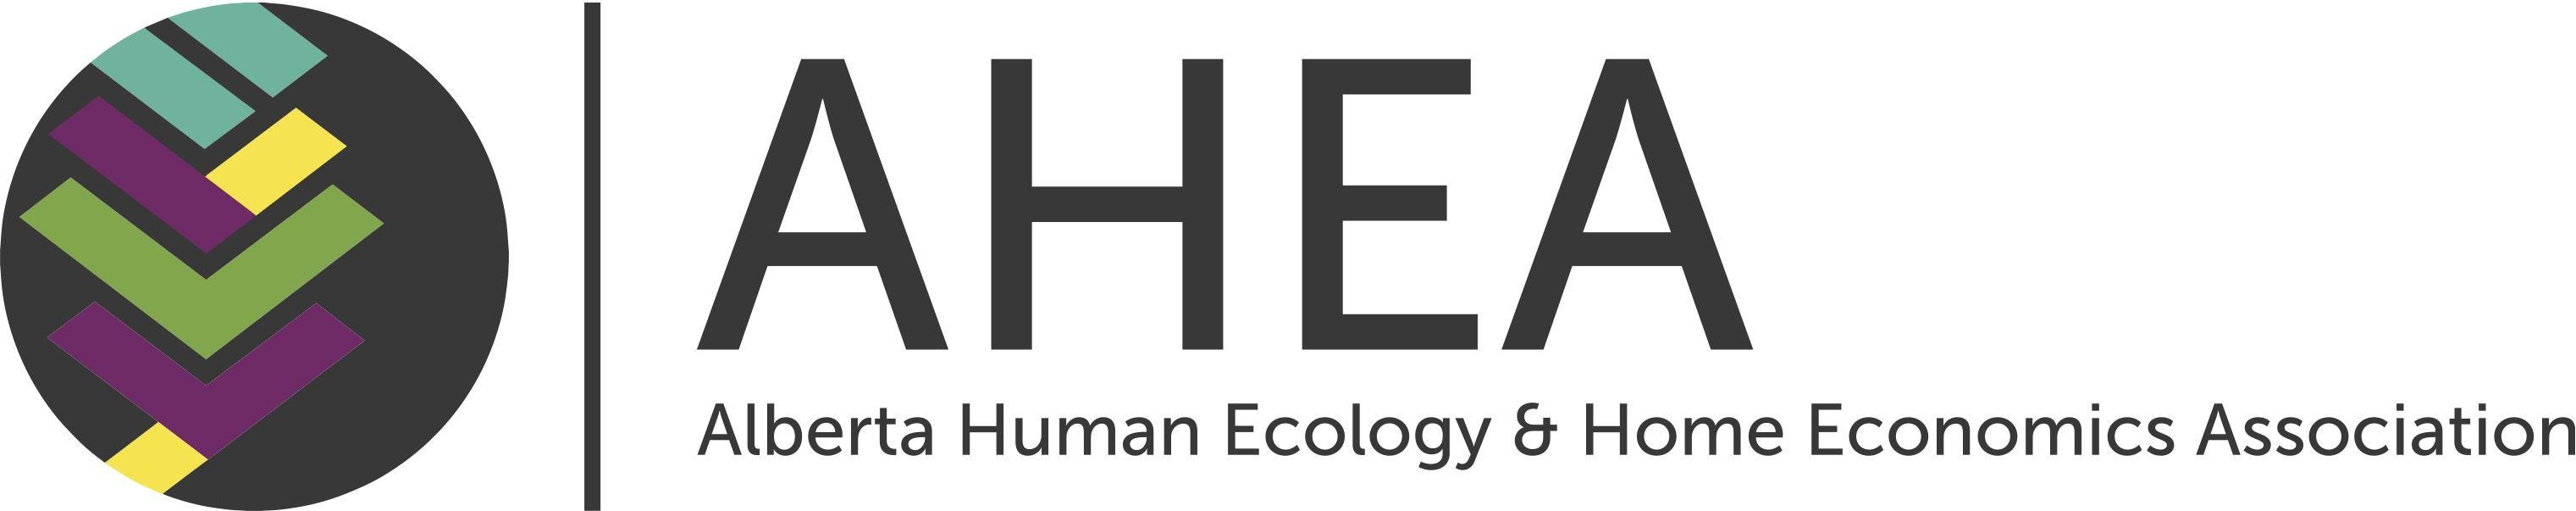 Alberta Human Ecology and Home Economics Association